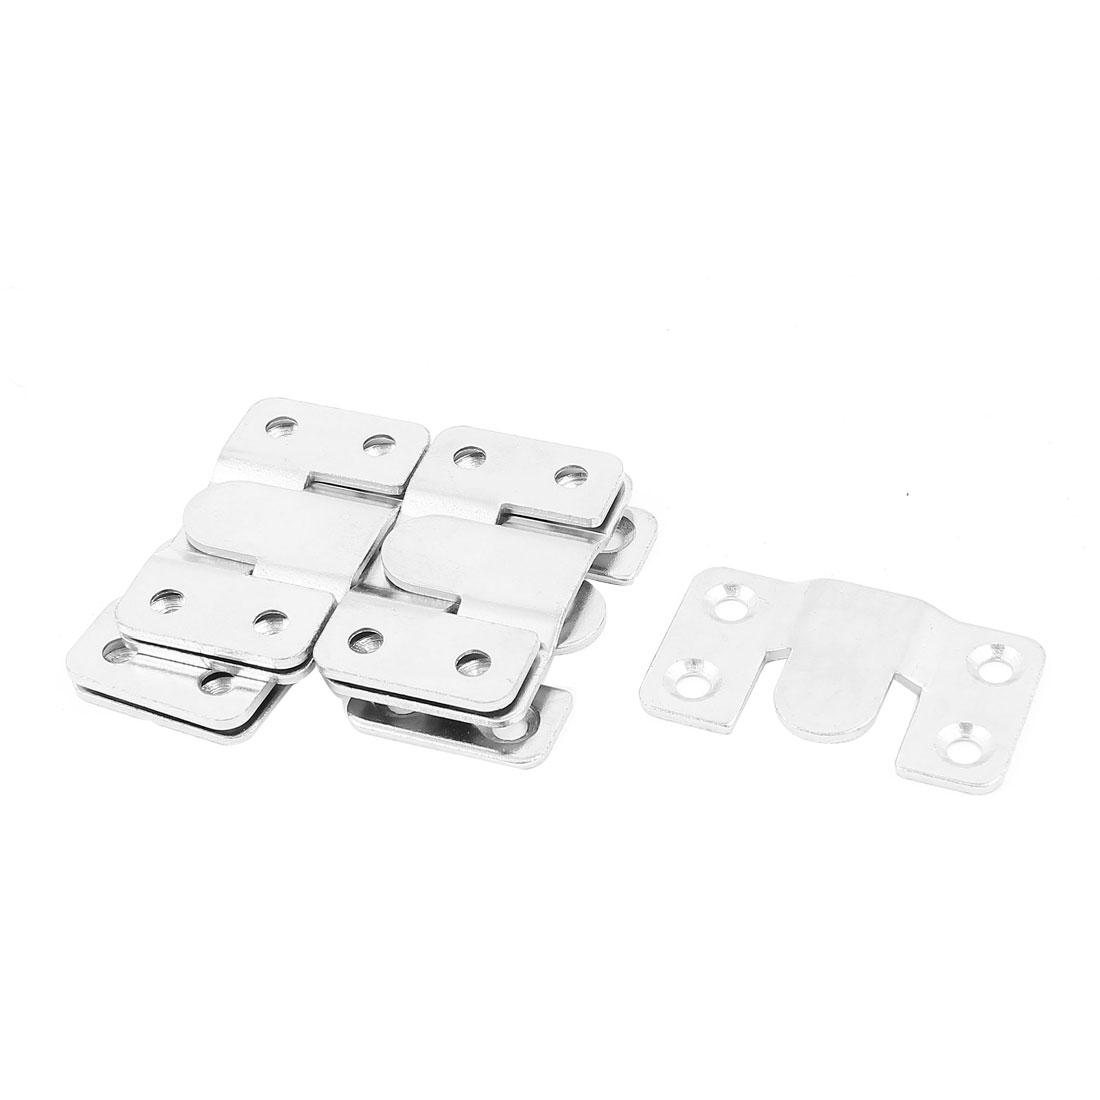 Metal Bed Rail Bracket Fitting Fastener Brass Tone 4 Sets